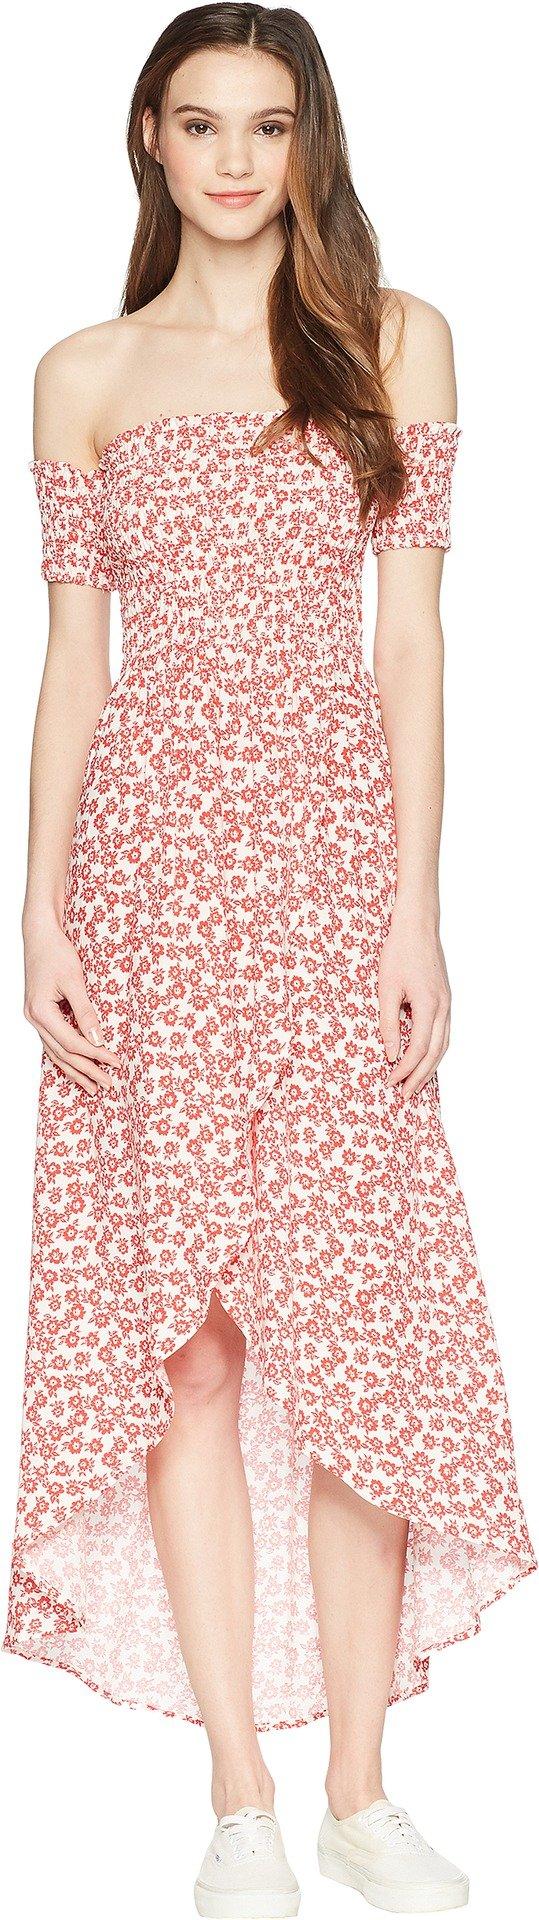 Lucy Love Women's Tranquility Dress Pomegranet Medium